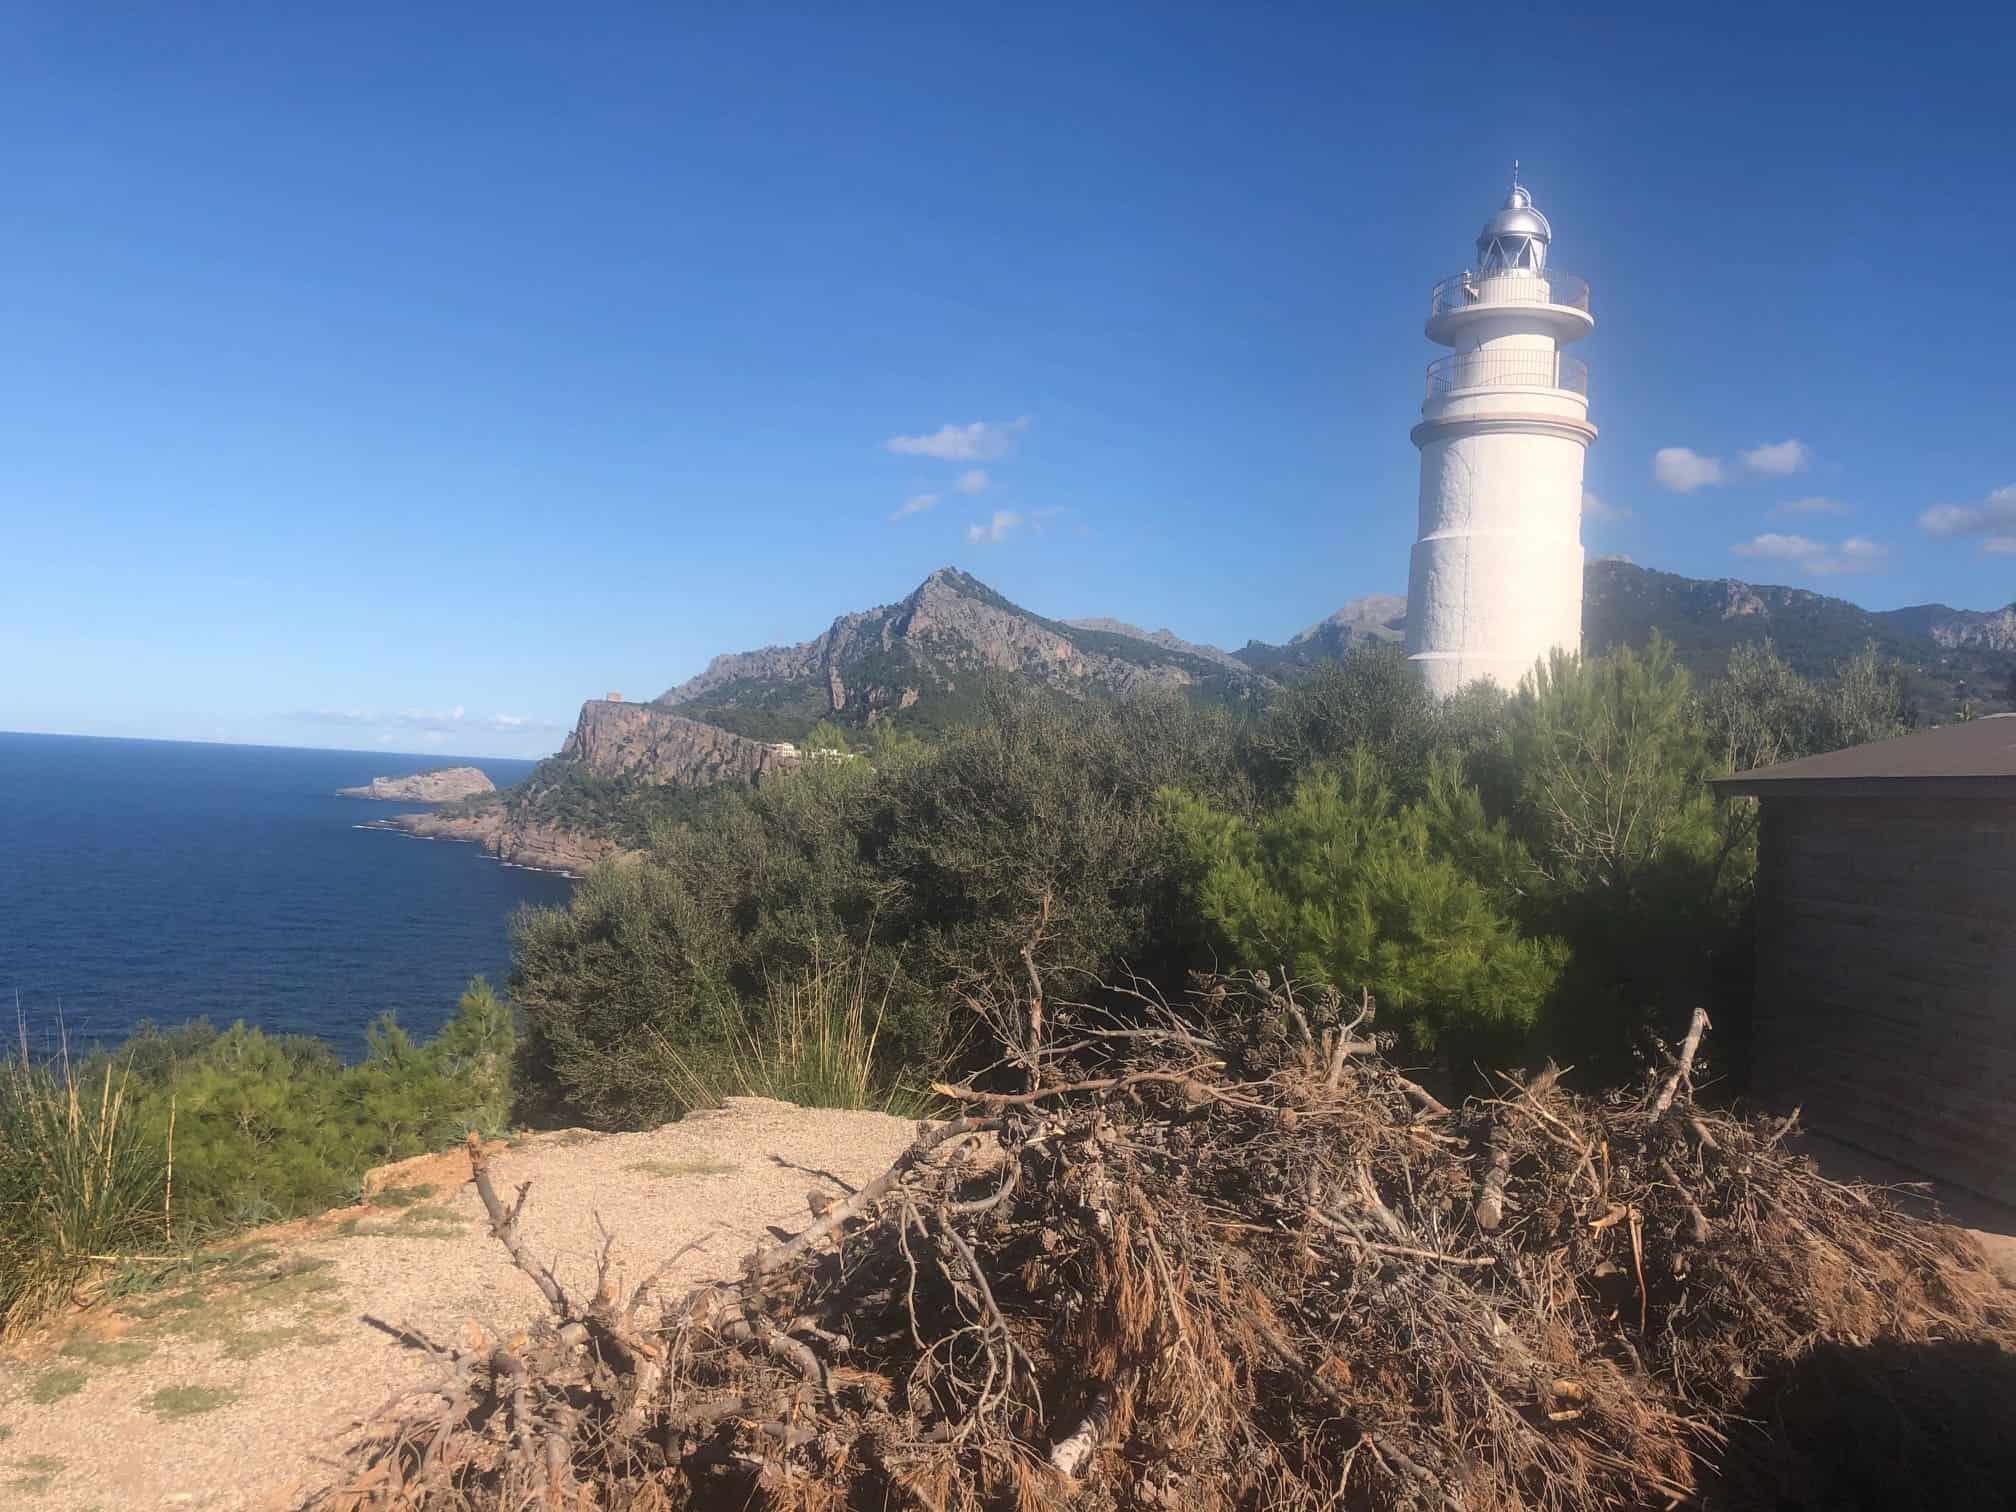 Corona-Regeln für Urlaub nach Mallorca Ostern 2021